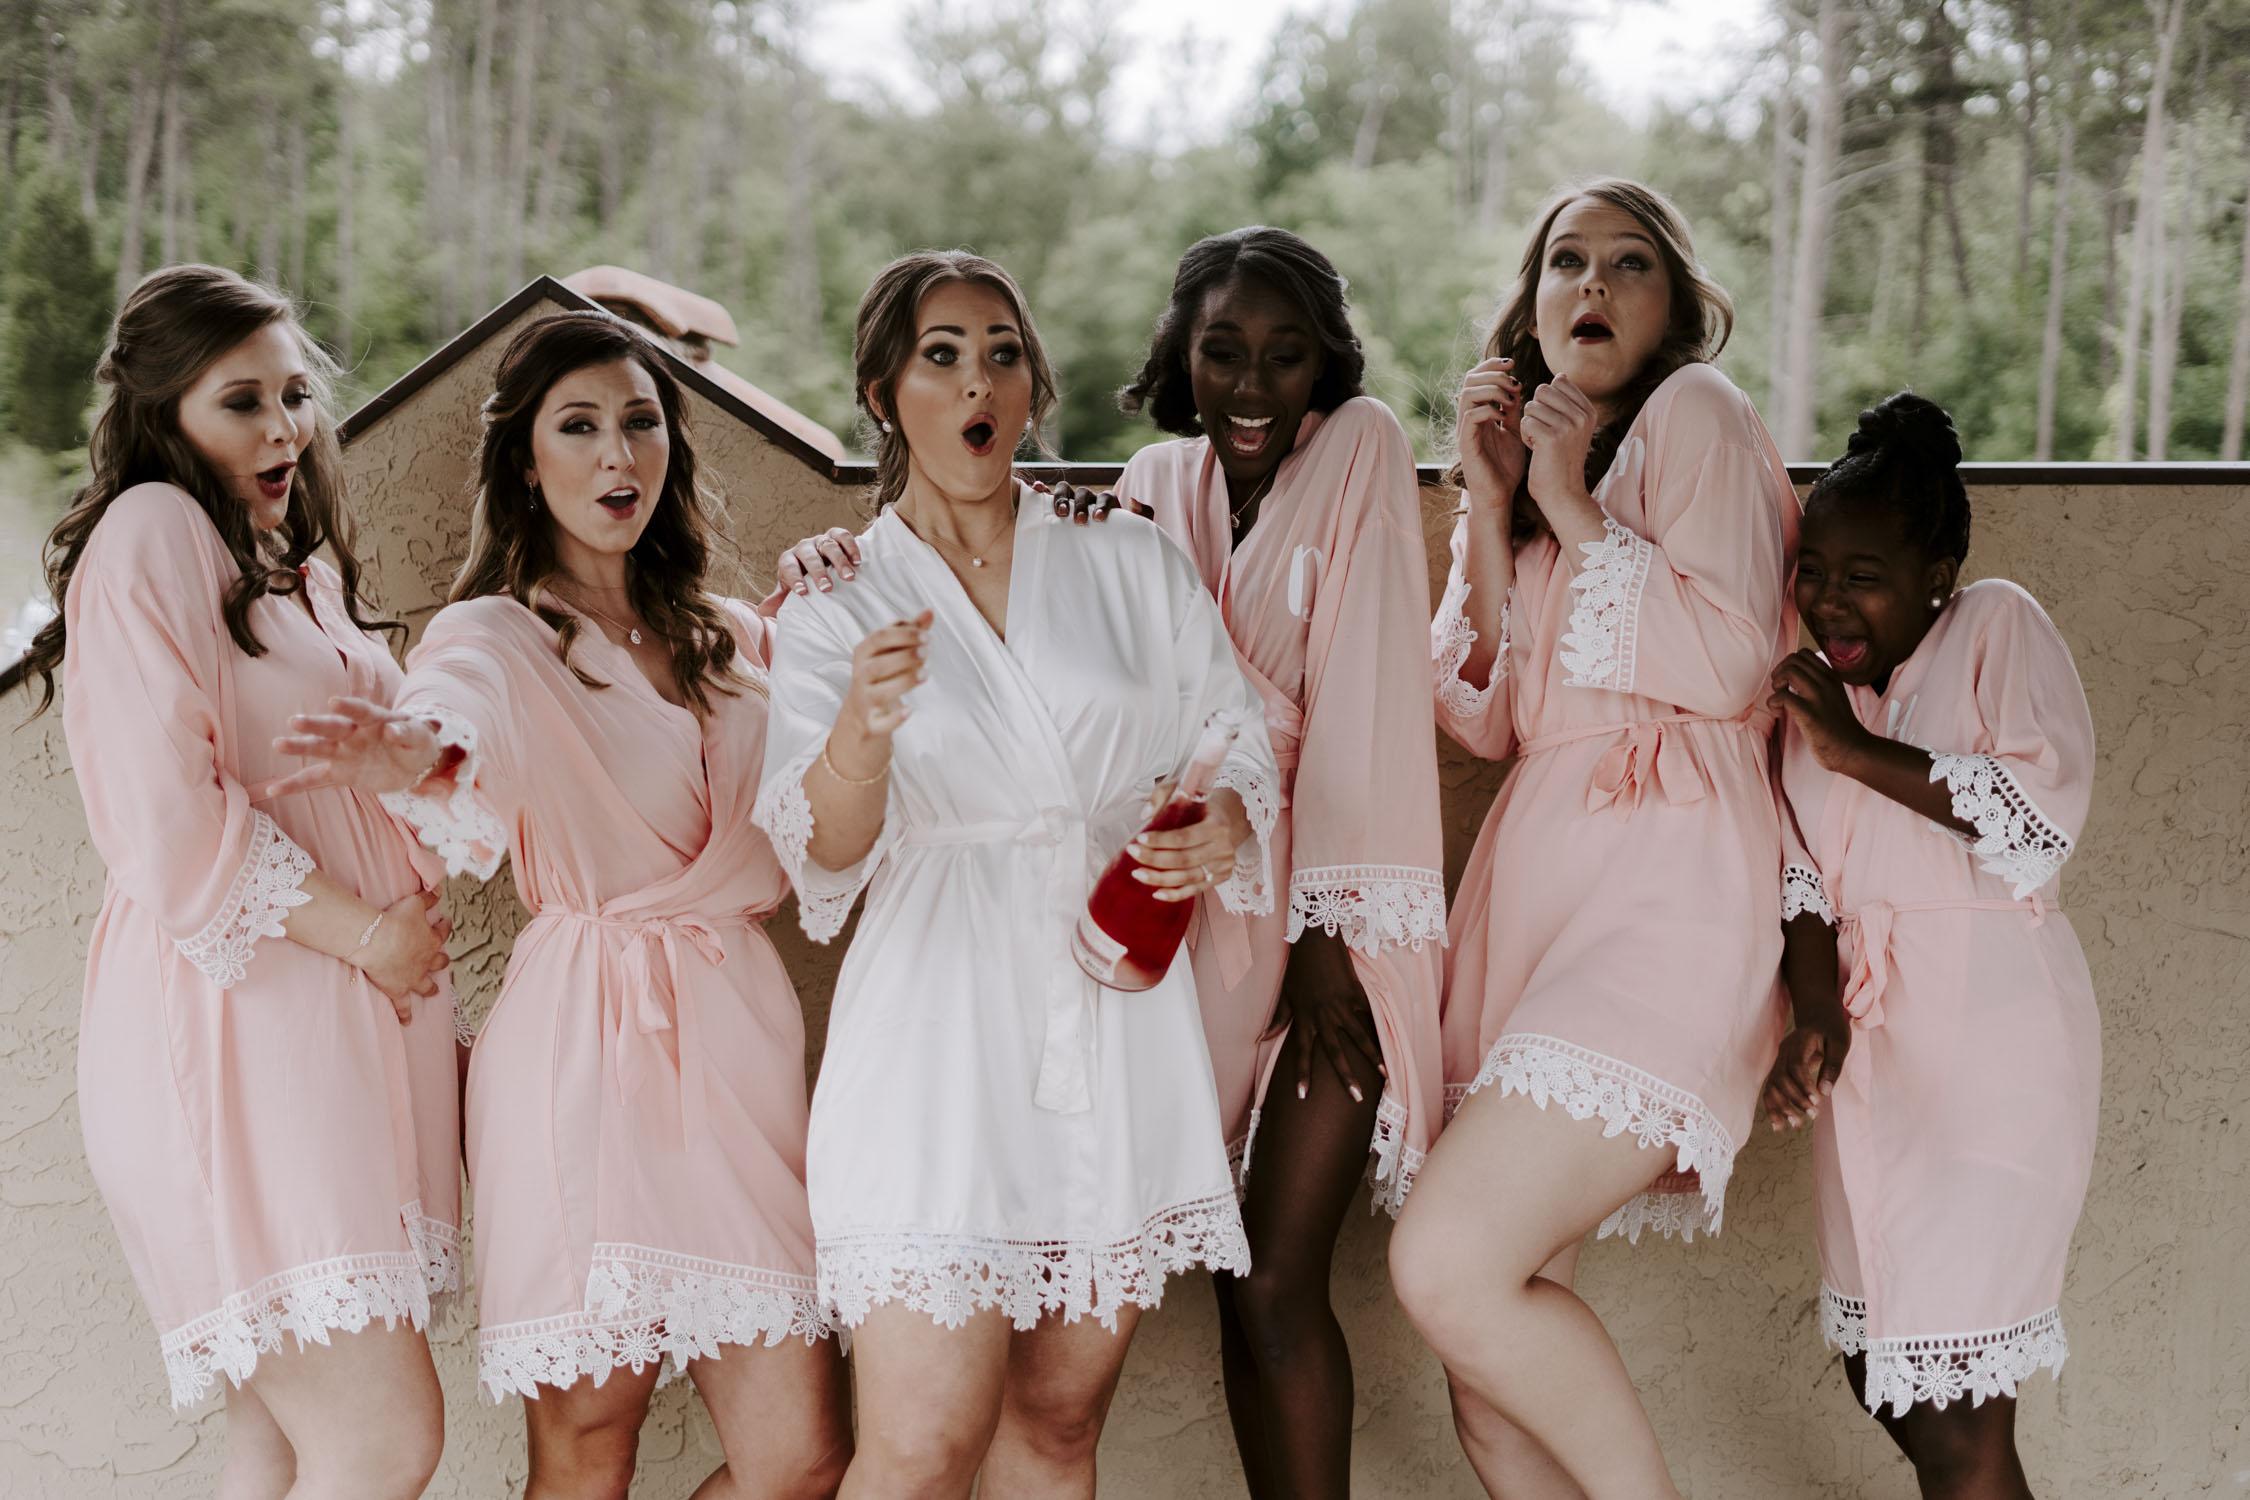 Katlyn&JacobRodgers 088.jpgRainy Bella Collina Wedding getting ready details | Kayli LaFon Photography, Greensboro Winston-Salem NC Wedding Photographer